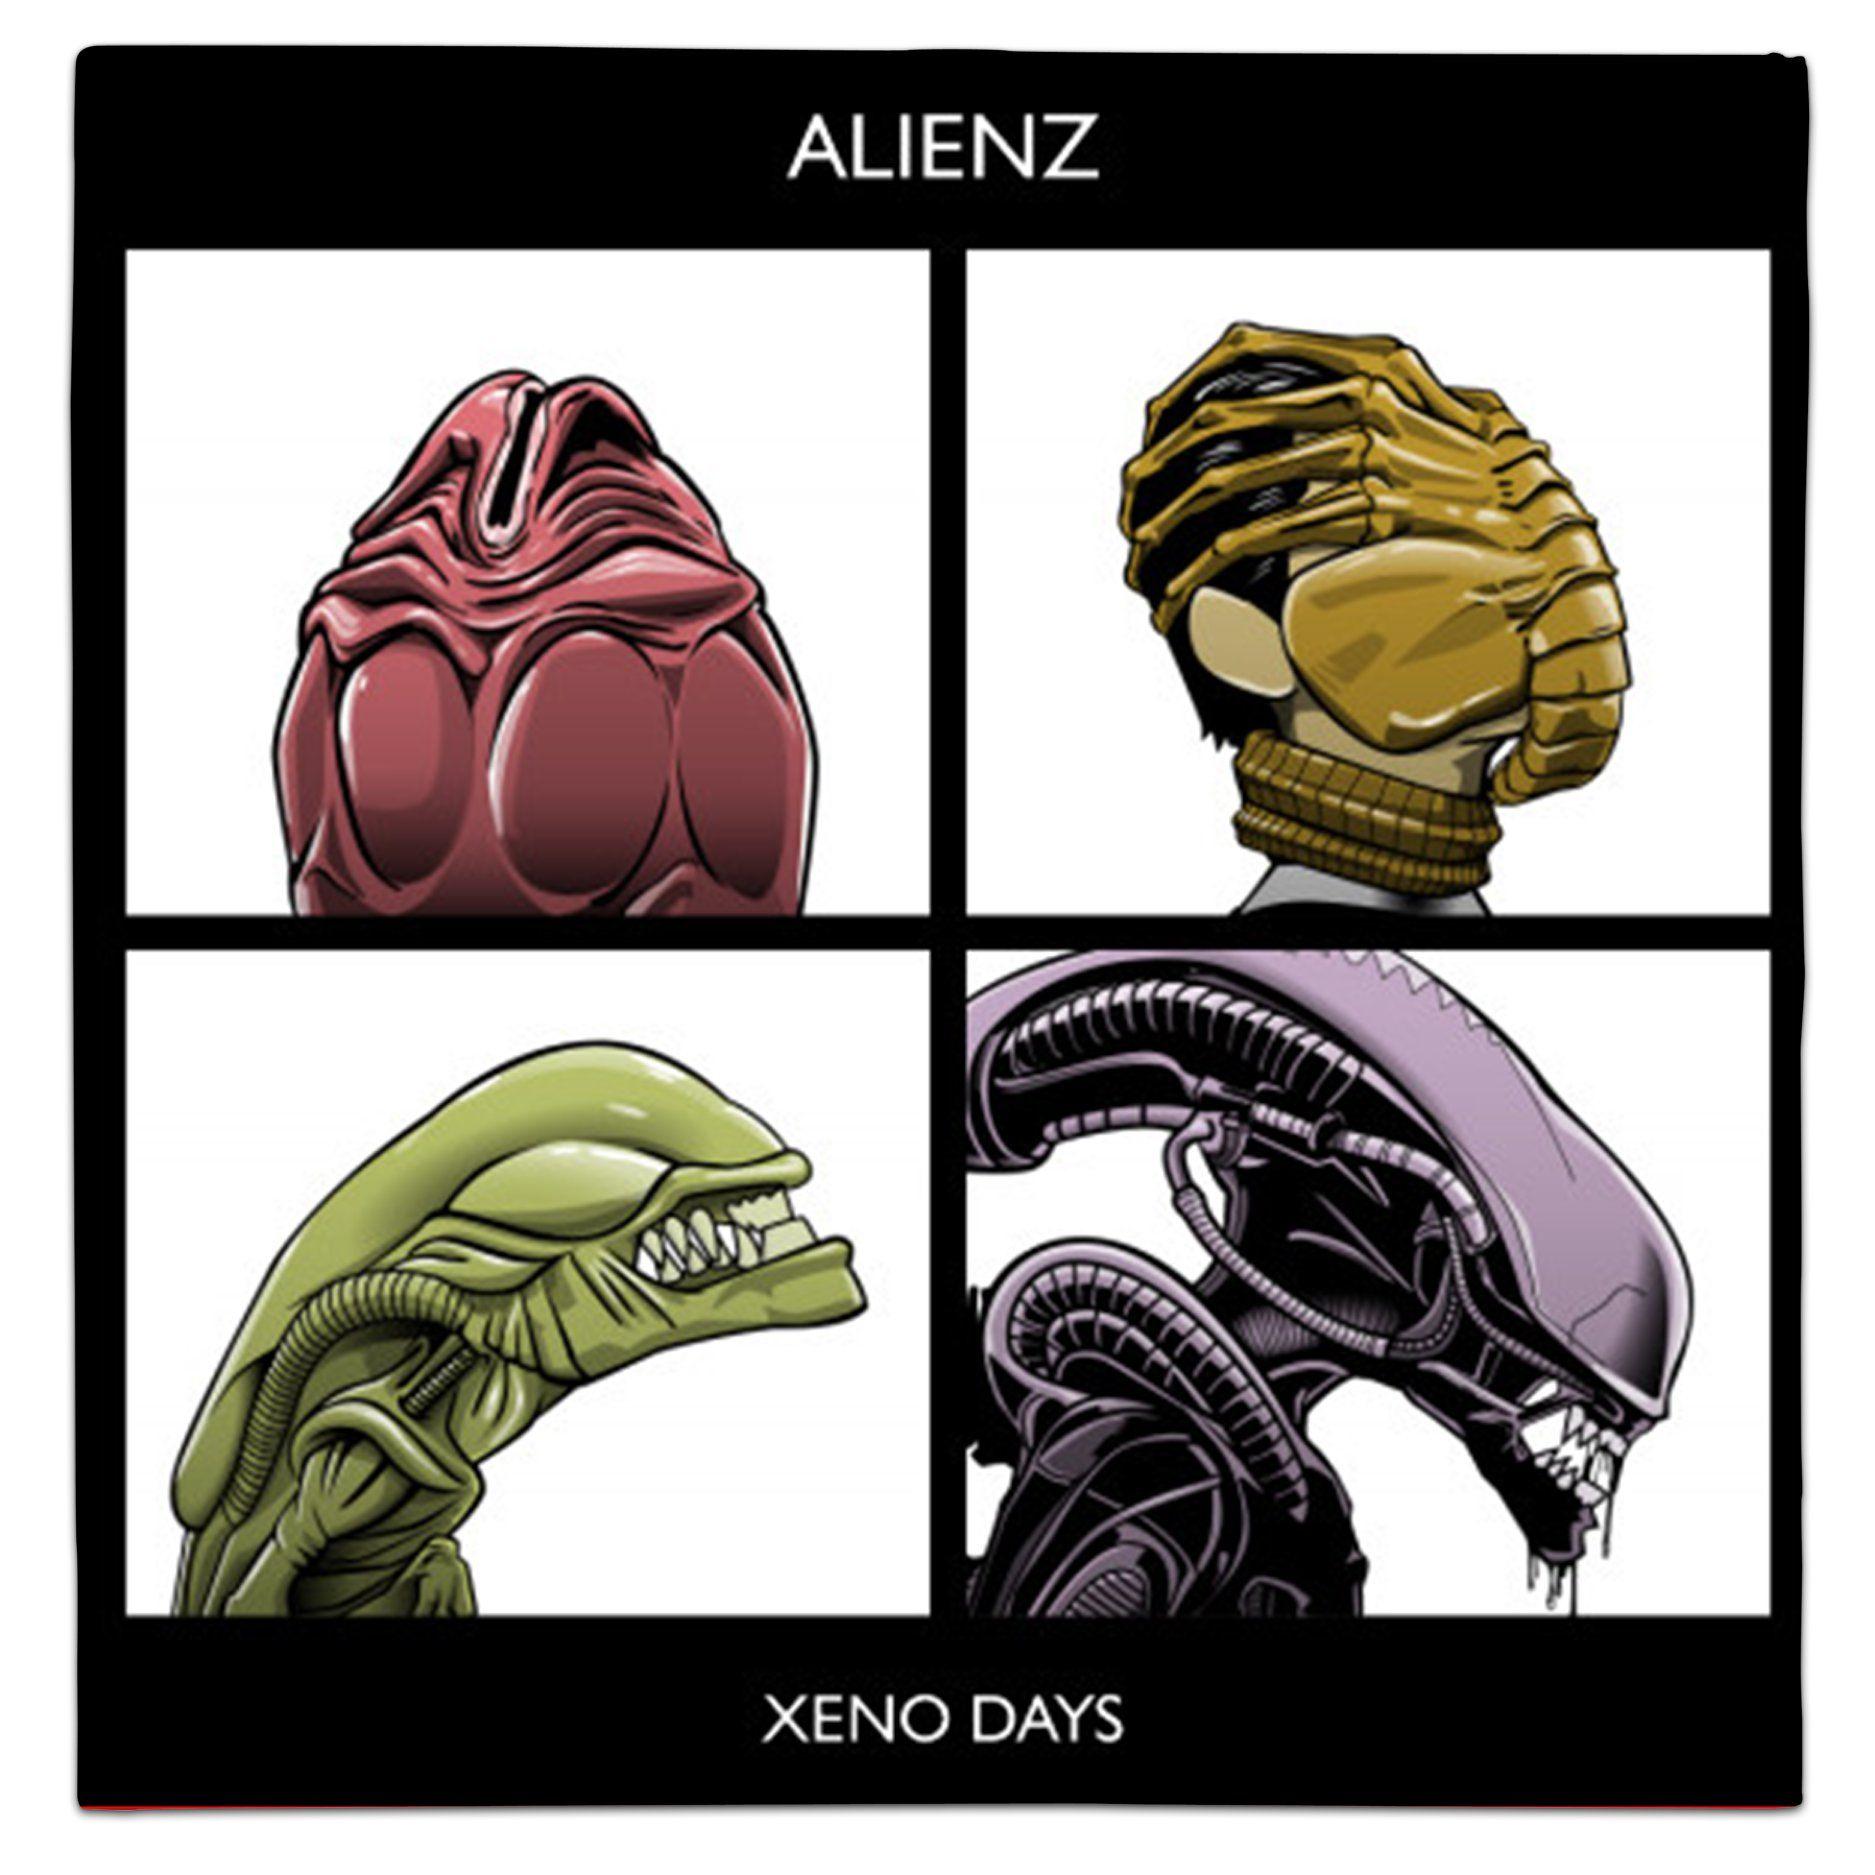 Gorillaz Demon Days Parody Alienz Xeno Days Xenomorph Facehugger Black T-Shirt